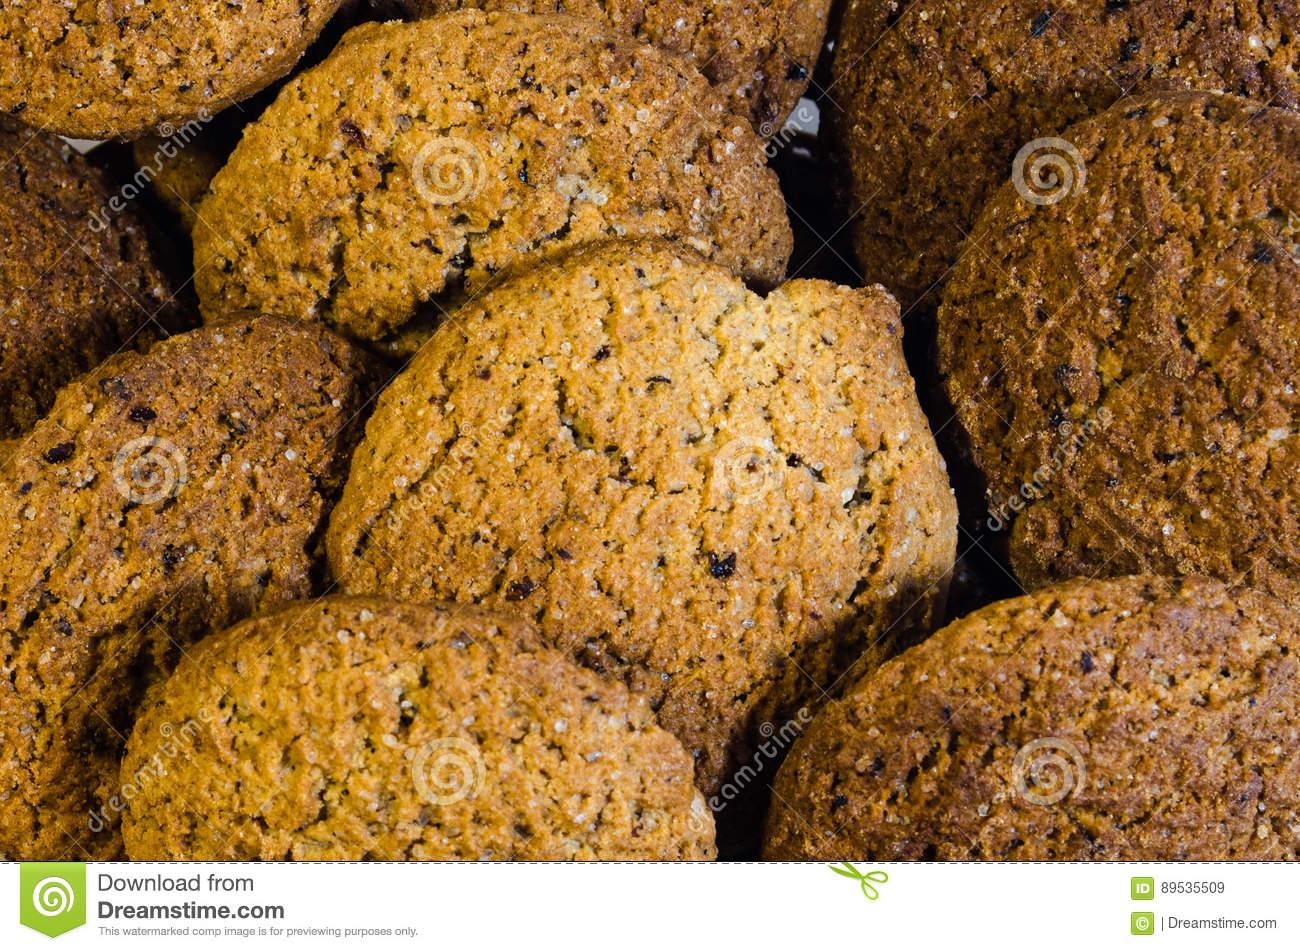 Oatmeal Cookies Stock Image  Image Of Baked, Isolated